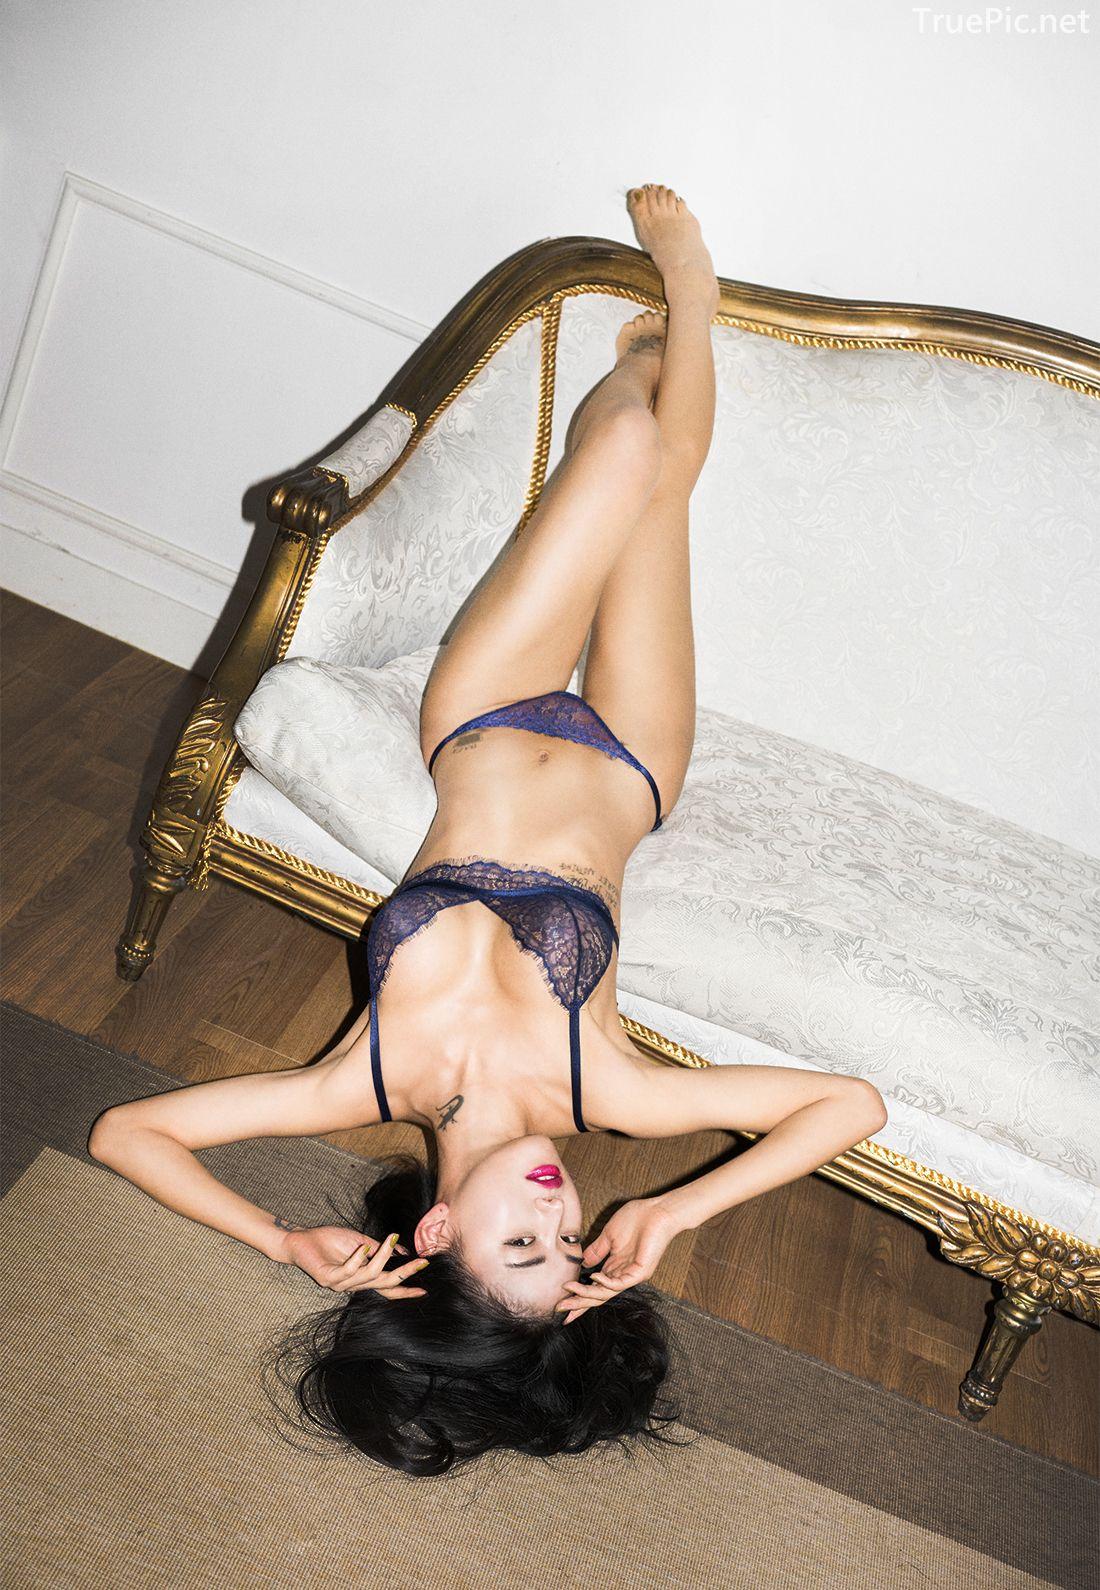 Korean Fashion Model - Baek Ye Jin - Sexy Lingerie Collection - TruePic.net - Picture 1